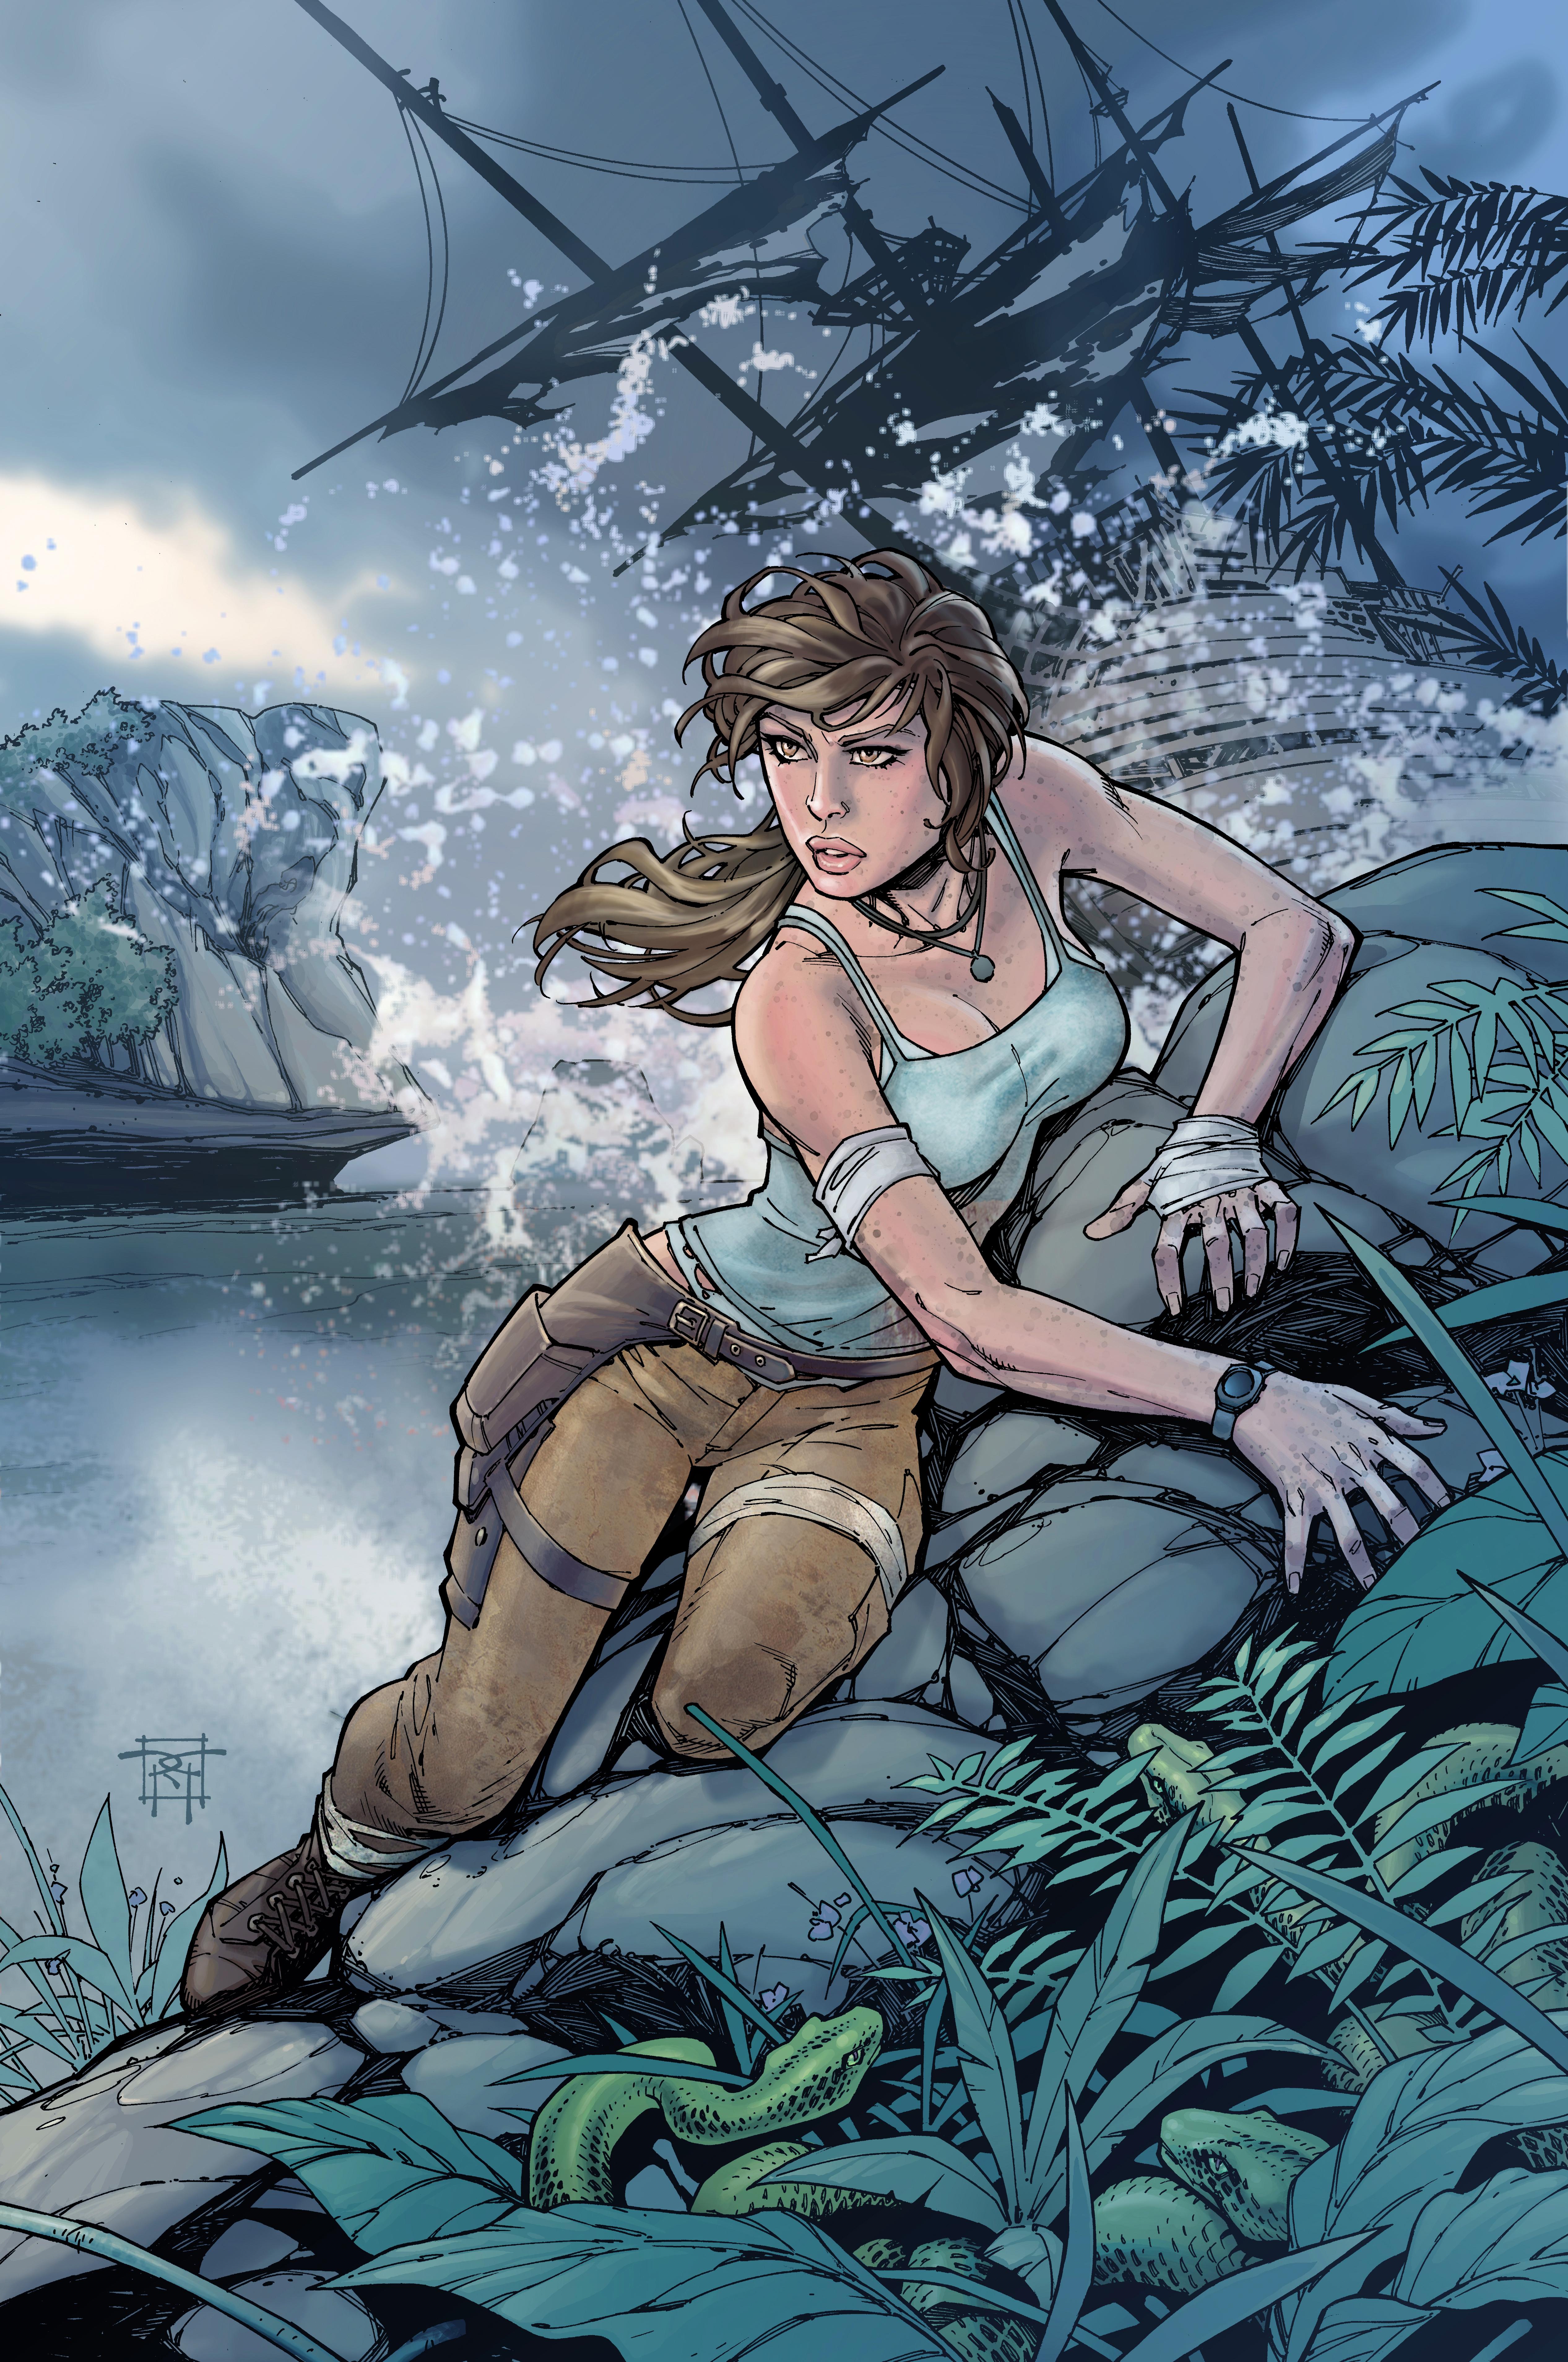 Lara Croft by Andy Park